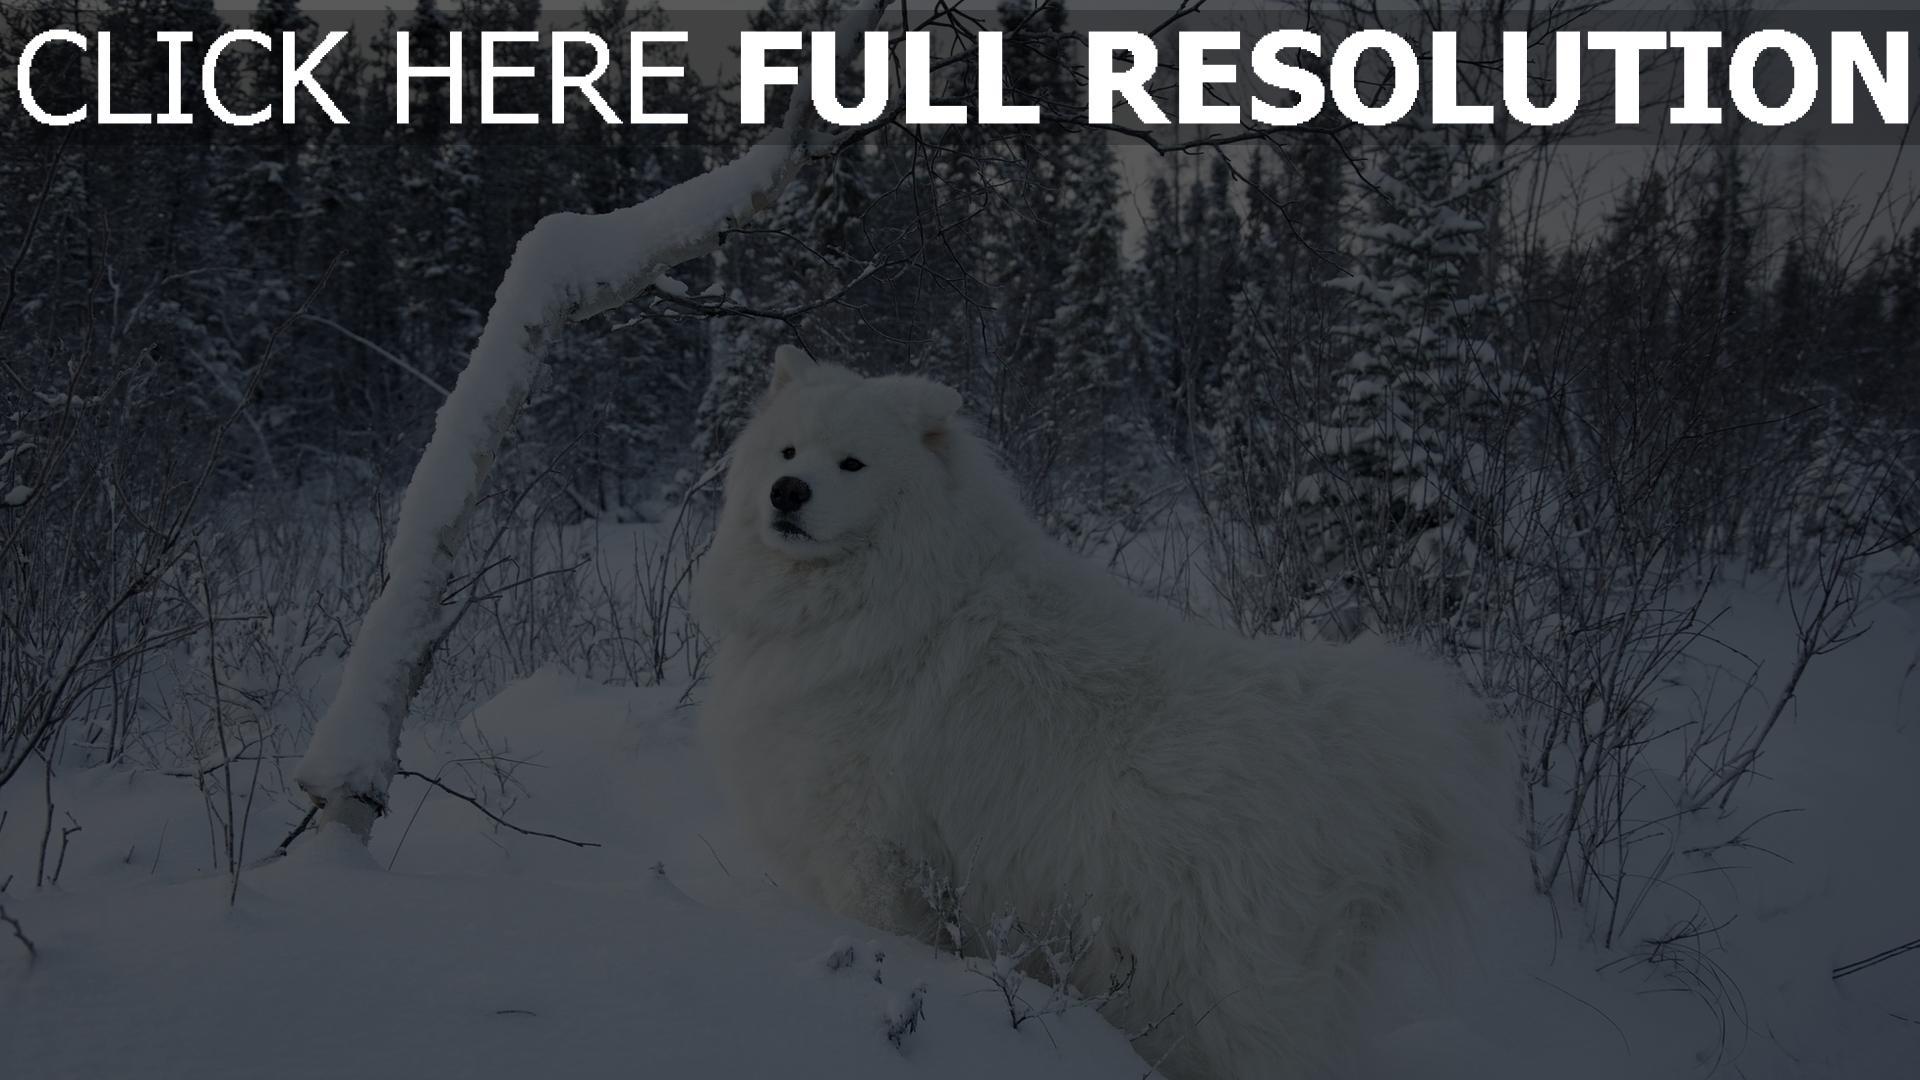 hd hintergrundbilder schnee spaziergang hund bäume 1920x1080